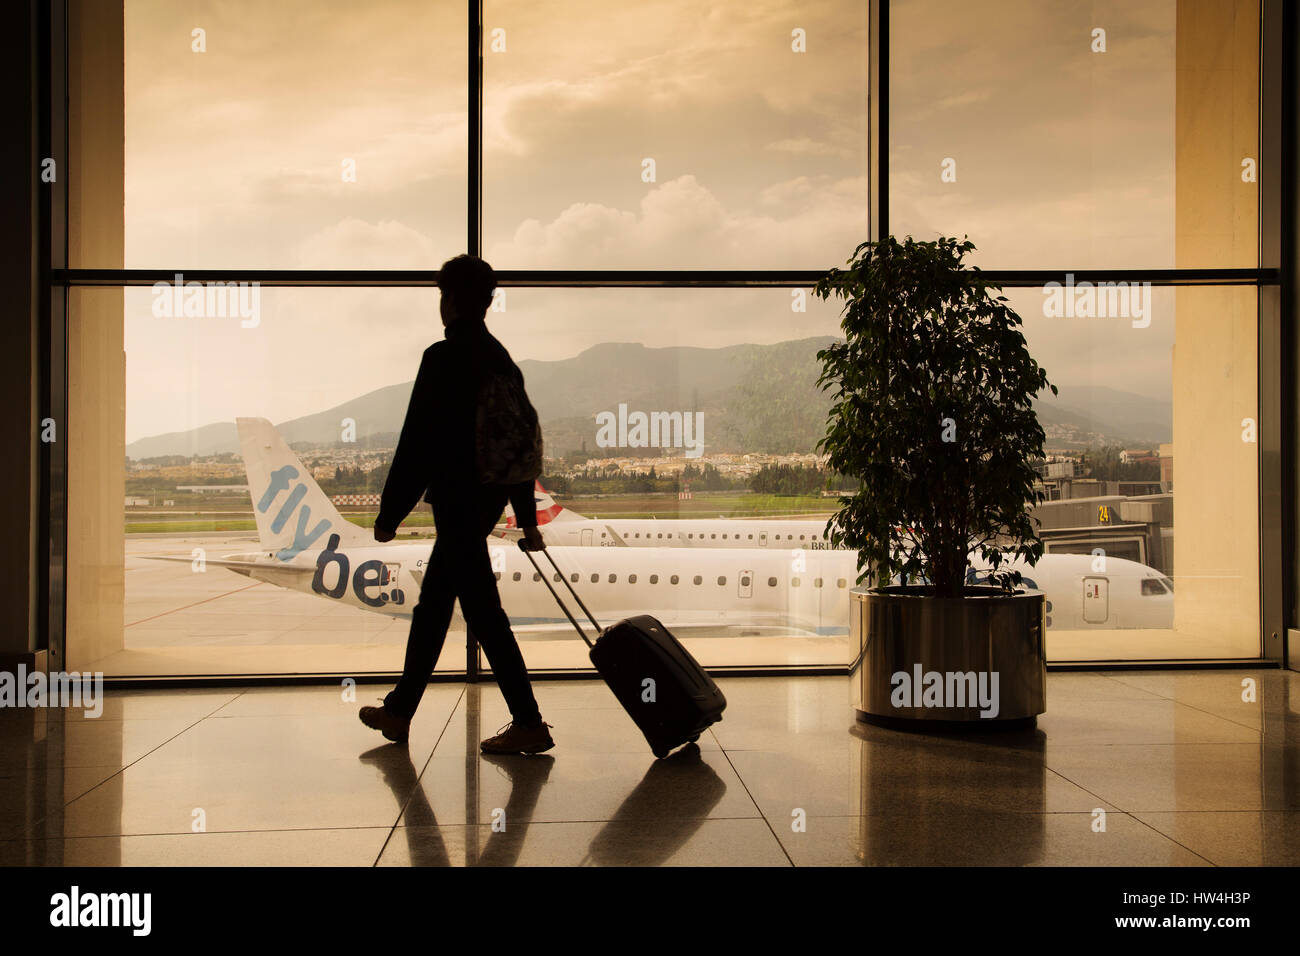 Touristen mit Gepäck am Flughafen Malaga. Costa Del Sol, Malaga. Andalusien Südspanien. Europa Stockbild